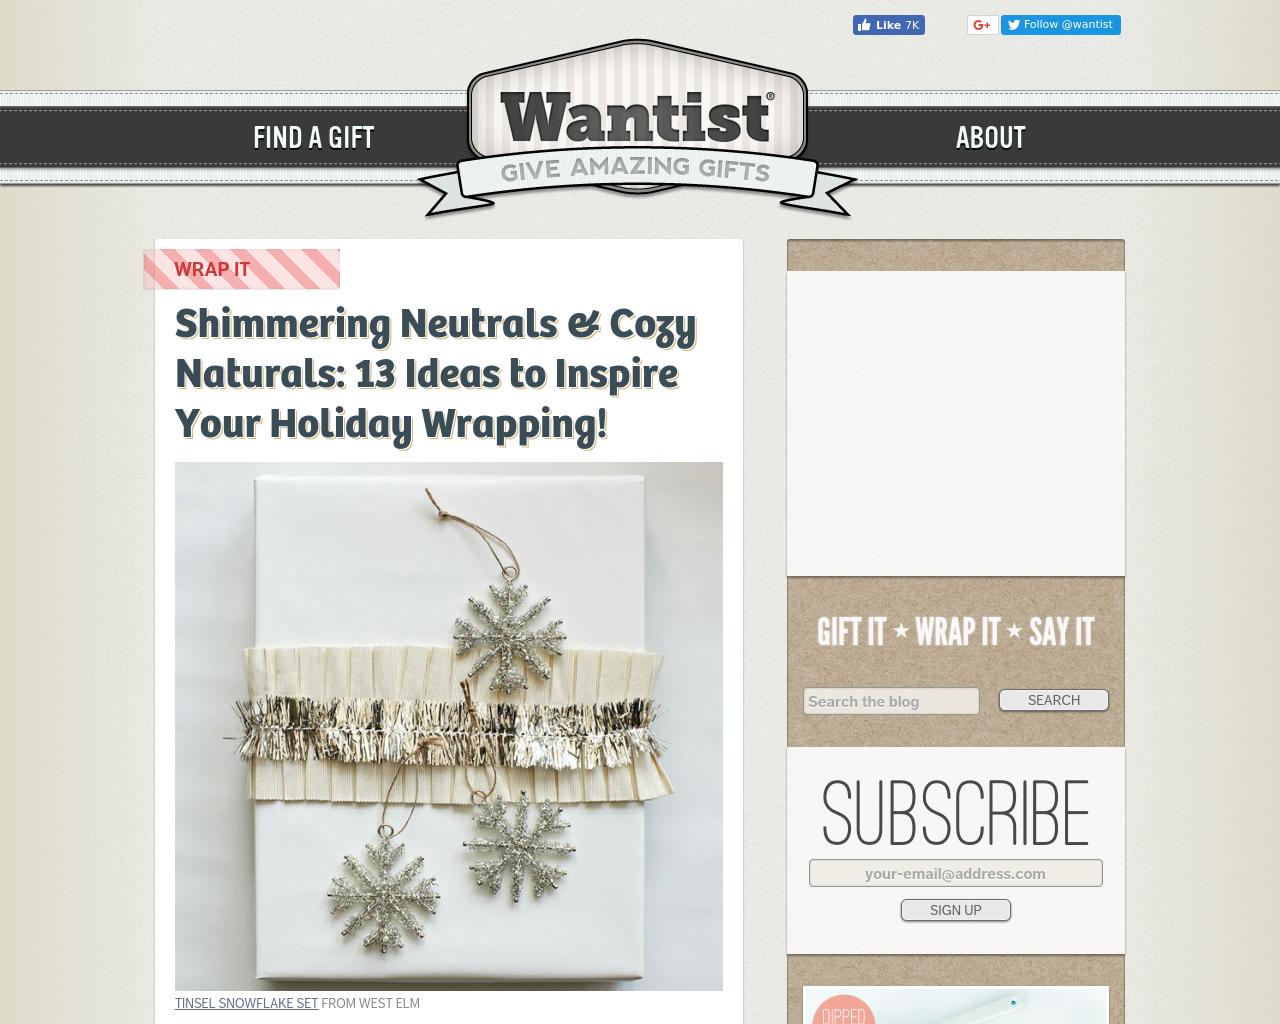 Wantist-Advertising-Reviews-Pricing